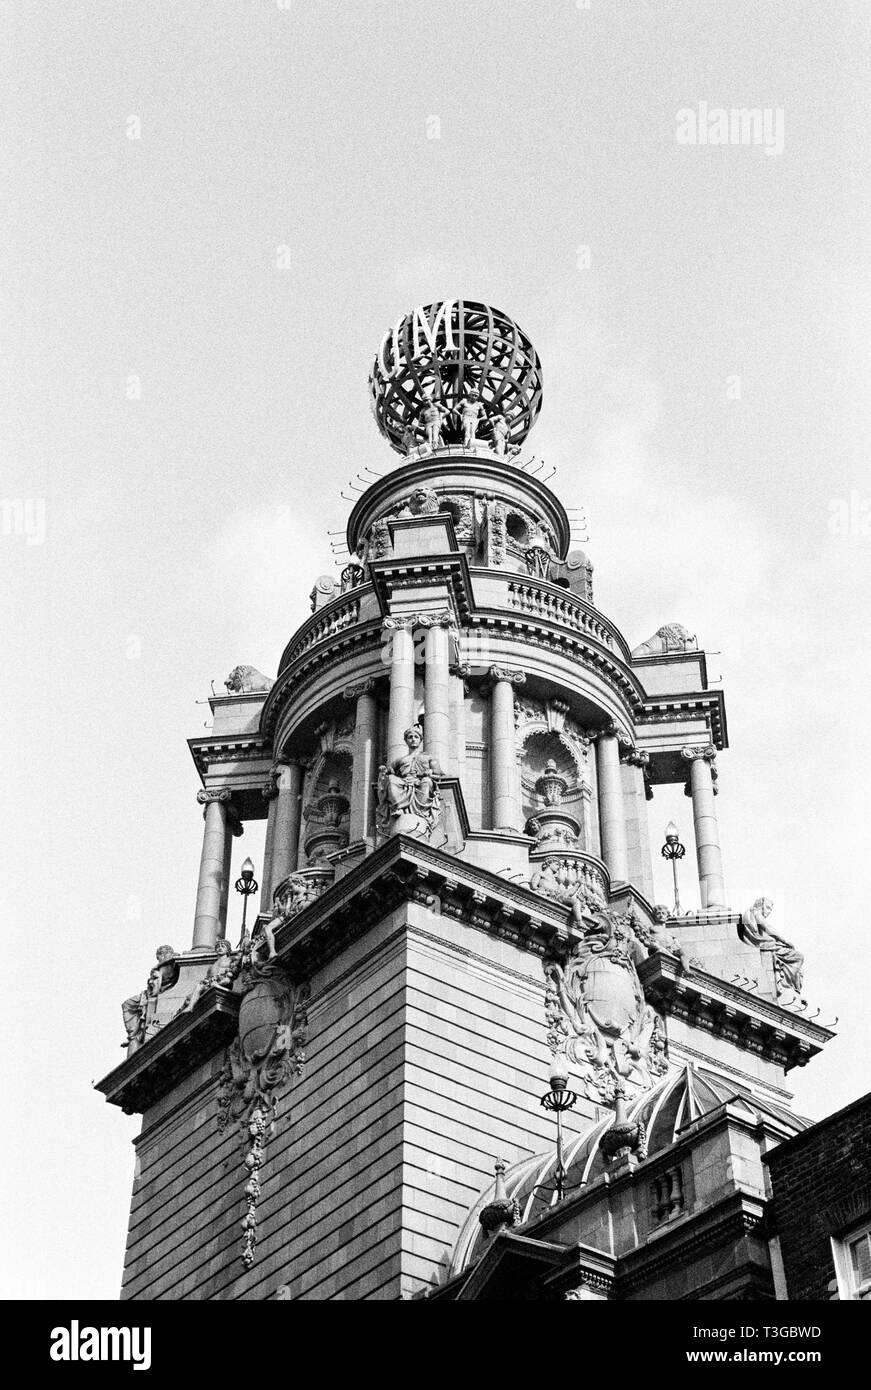 London Coliseum Theatre home of the English National Opera ENO, St Martin's Lane, London, United Kingdom. - Stock Image